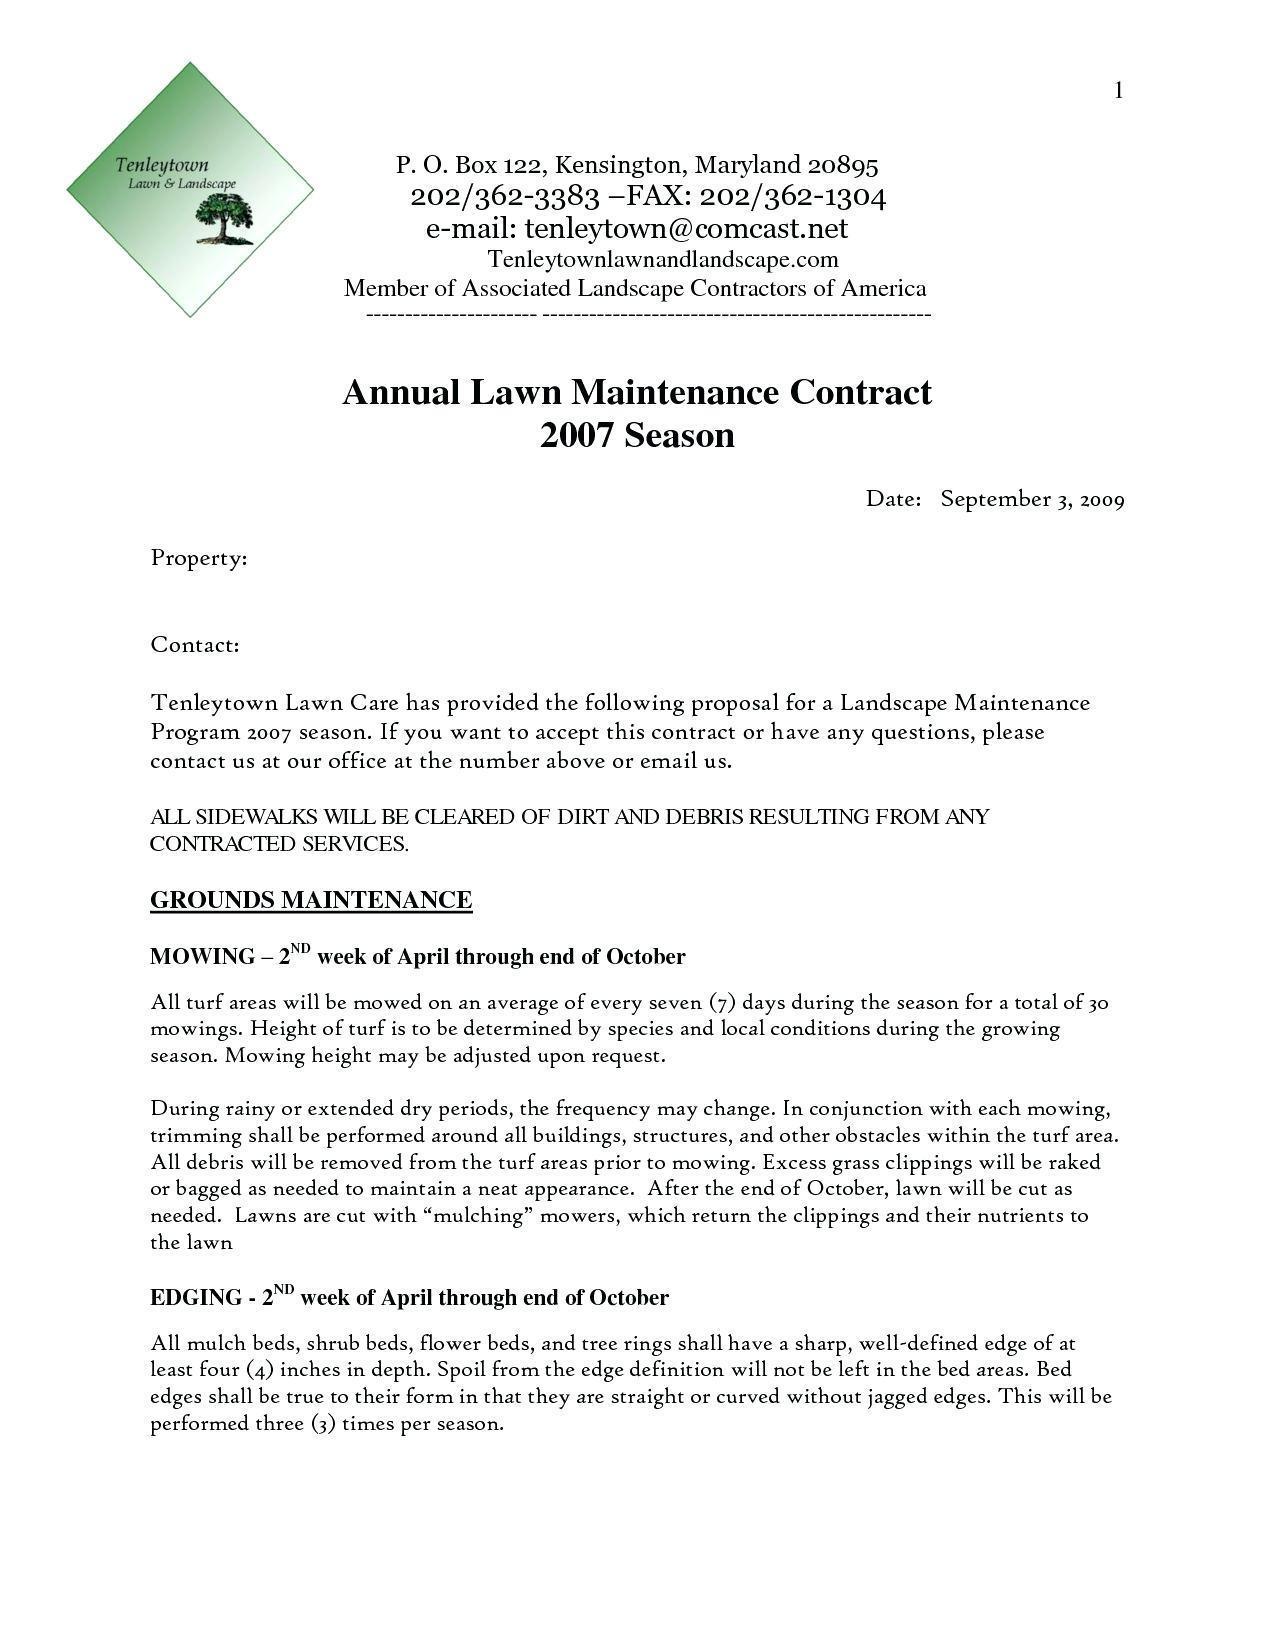 Gardening Contract Example